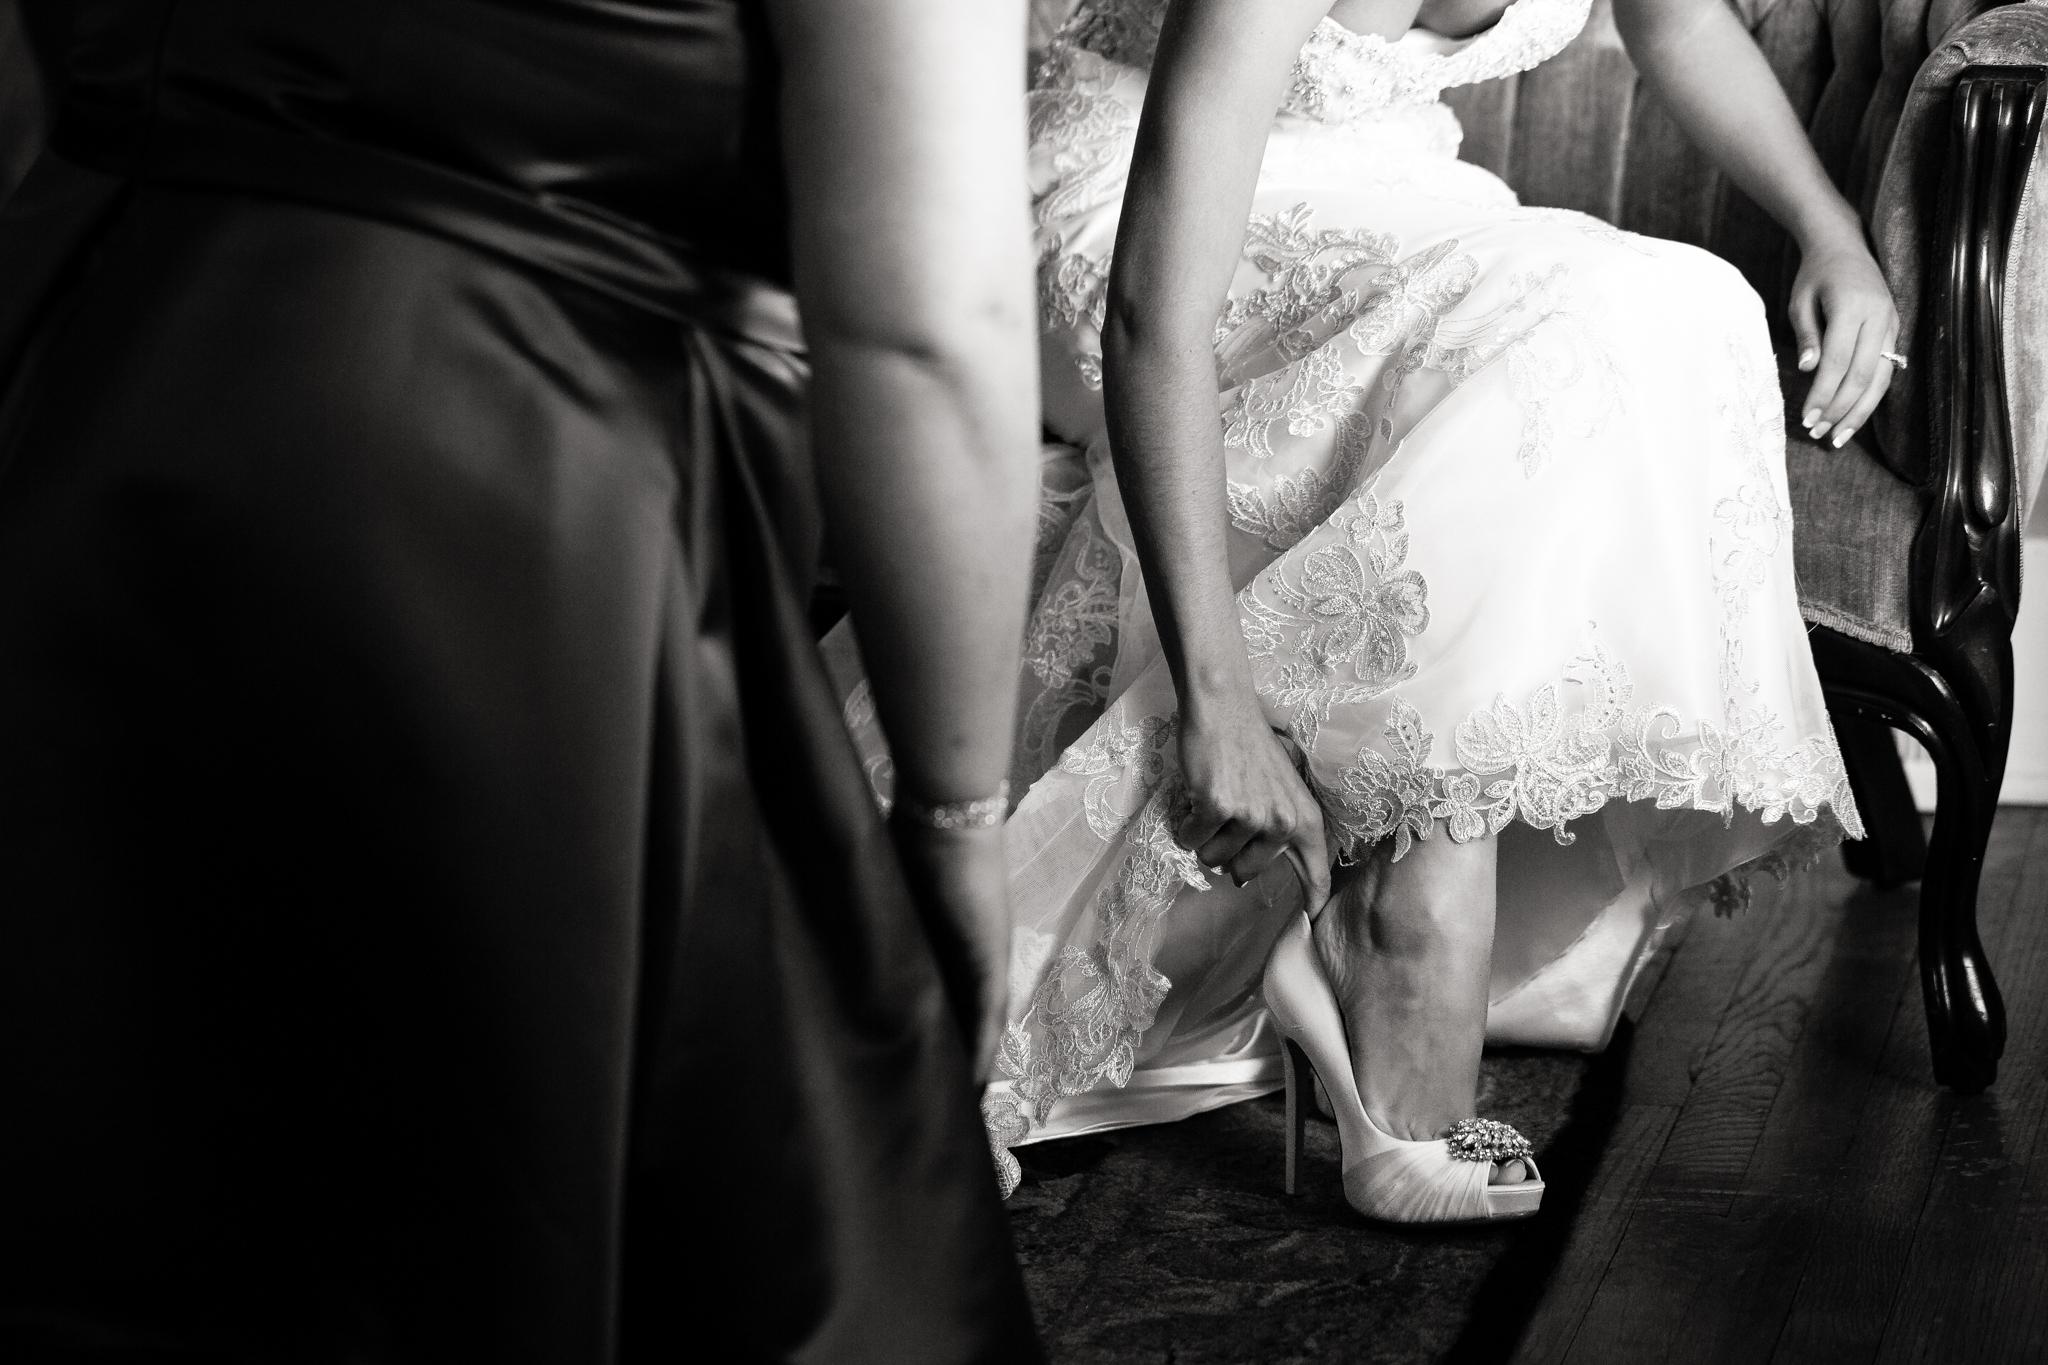 Statler-City-Buffalo-wedding-photographer- 0057bw.jpg